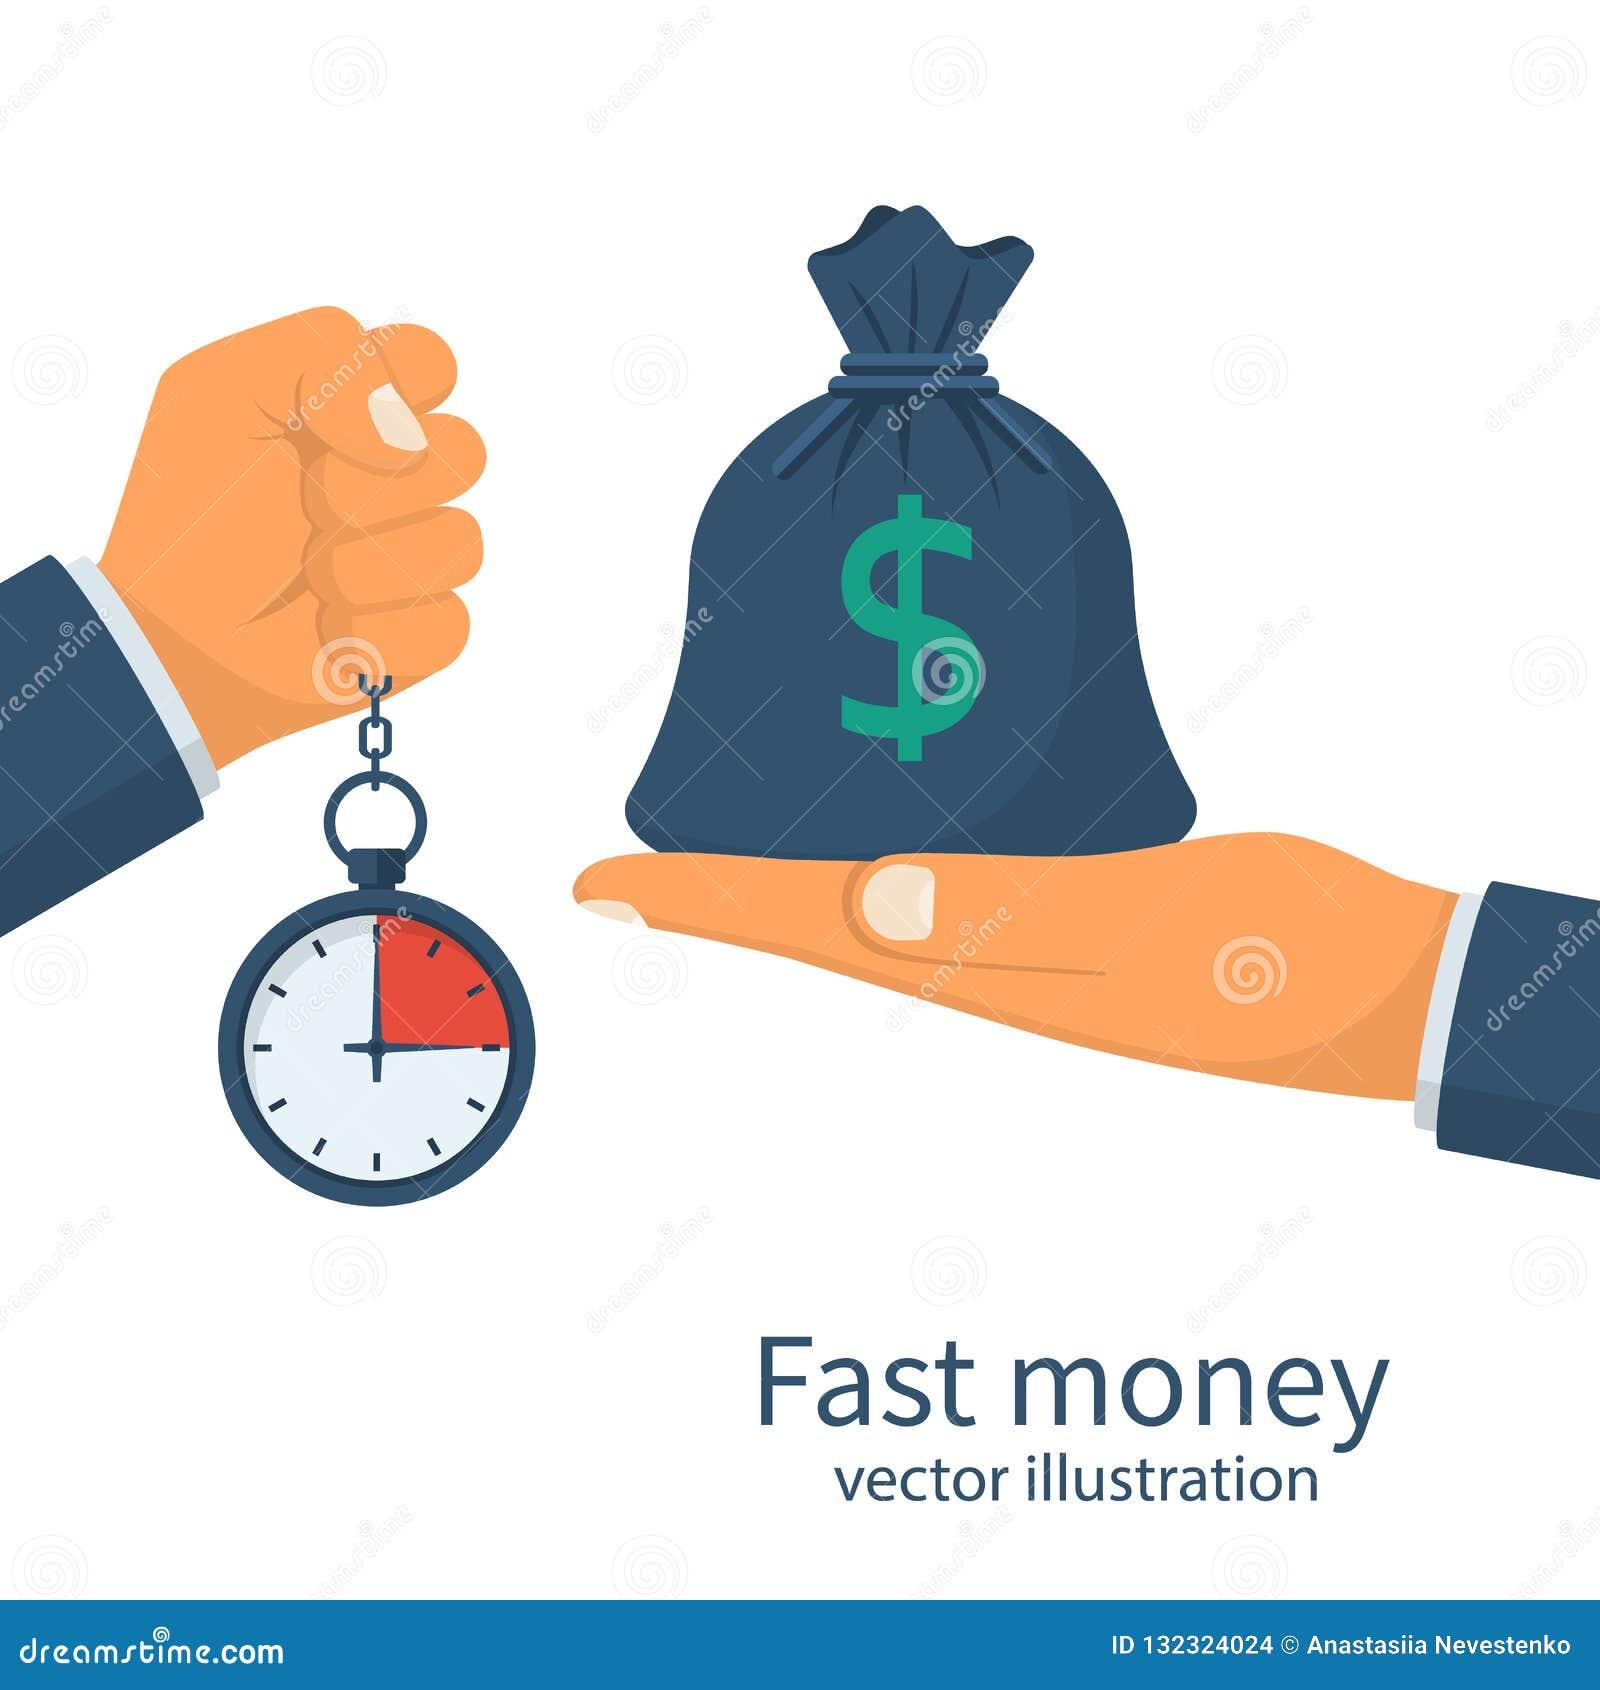 быстрый займ на короткий срок